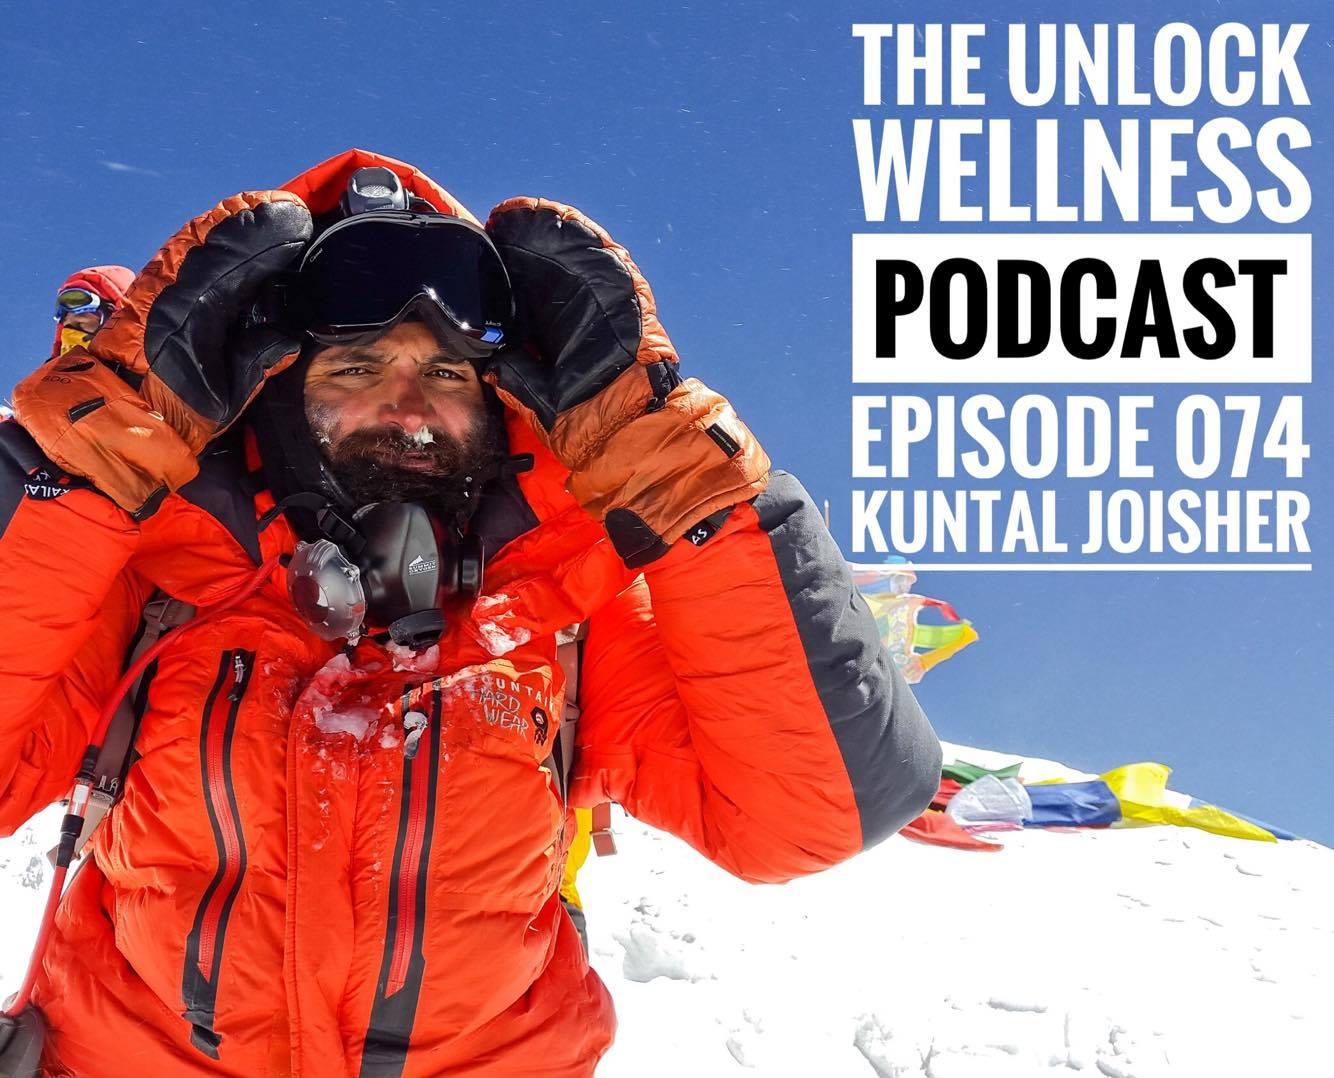 unlock wellness podcast episode